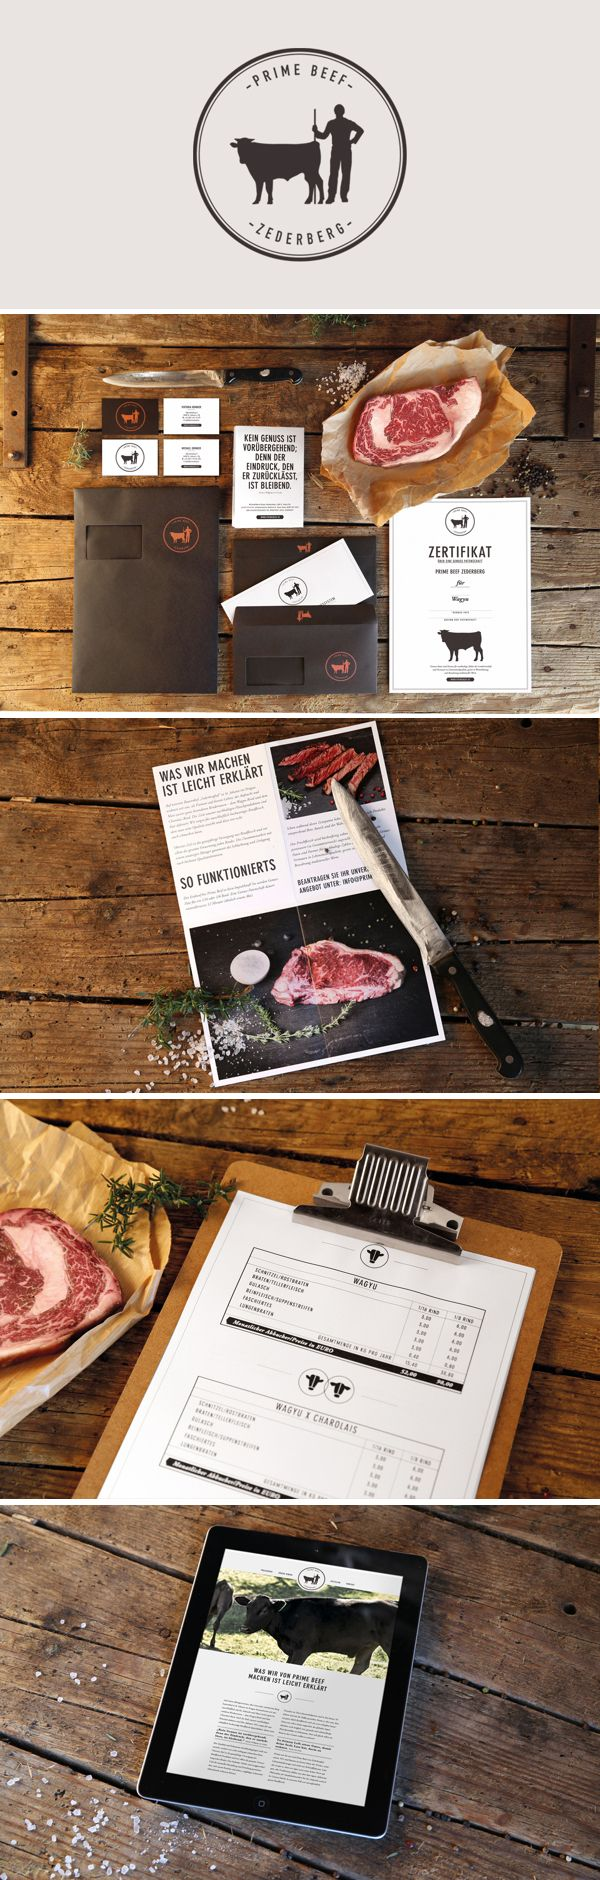 pinterest.com/fra411 #identity / prime beef / farm / meat / butcher